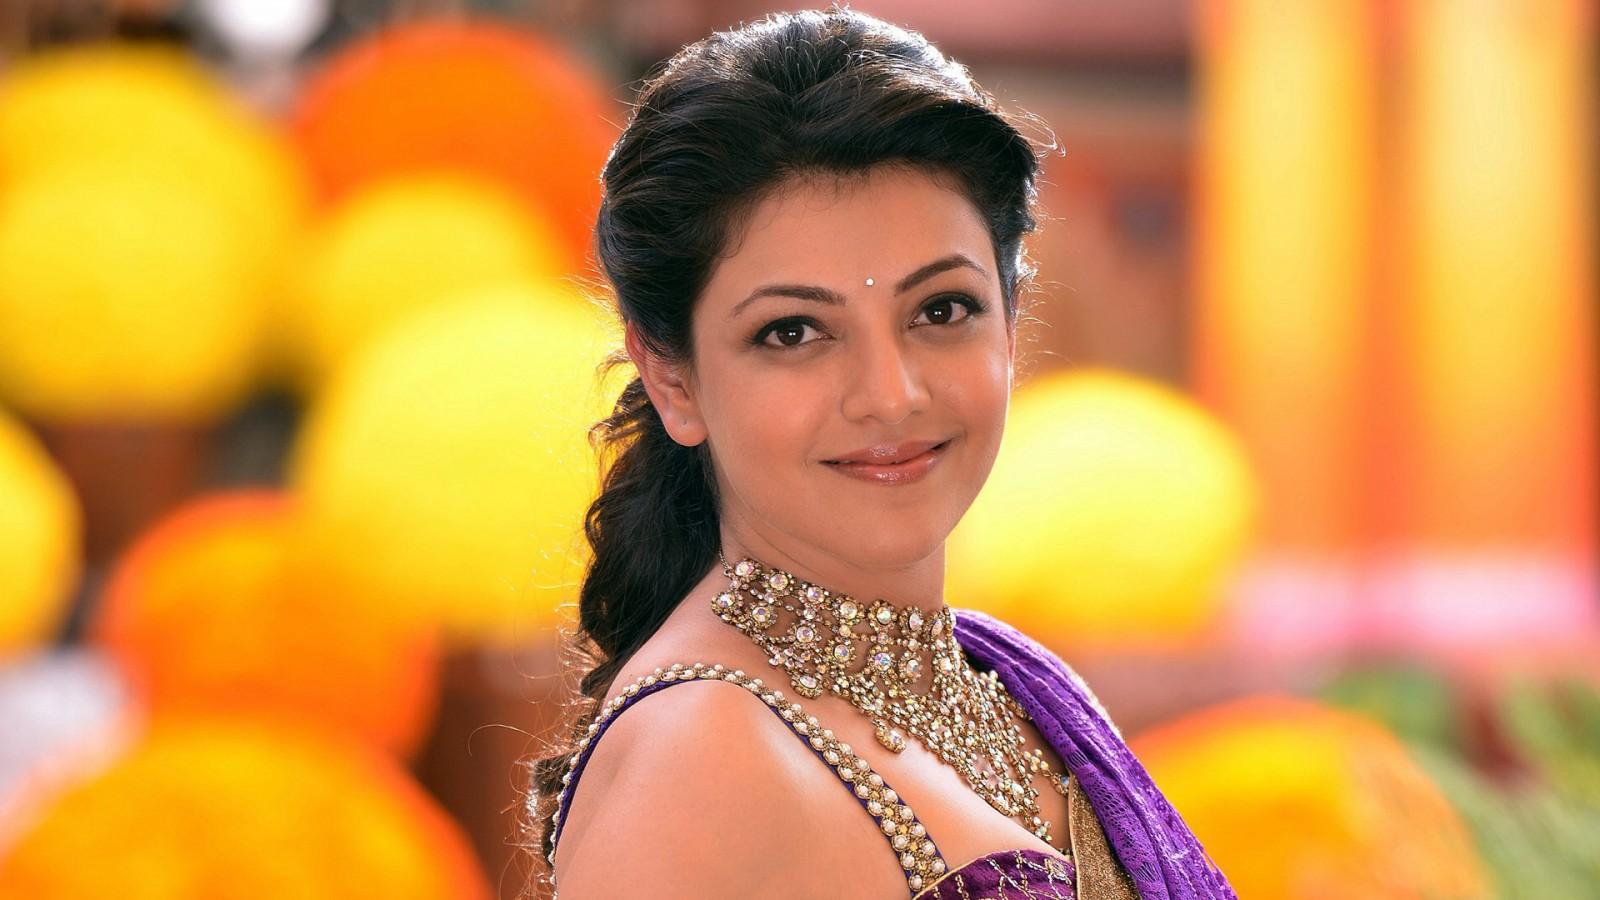 Beautiful Girl Face Hd Desktop Wallpaper Kajal In Govindudu Andarivadele Wallpapers Hd Wallpapers